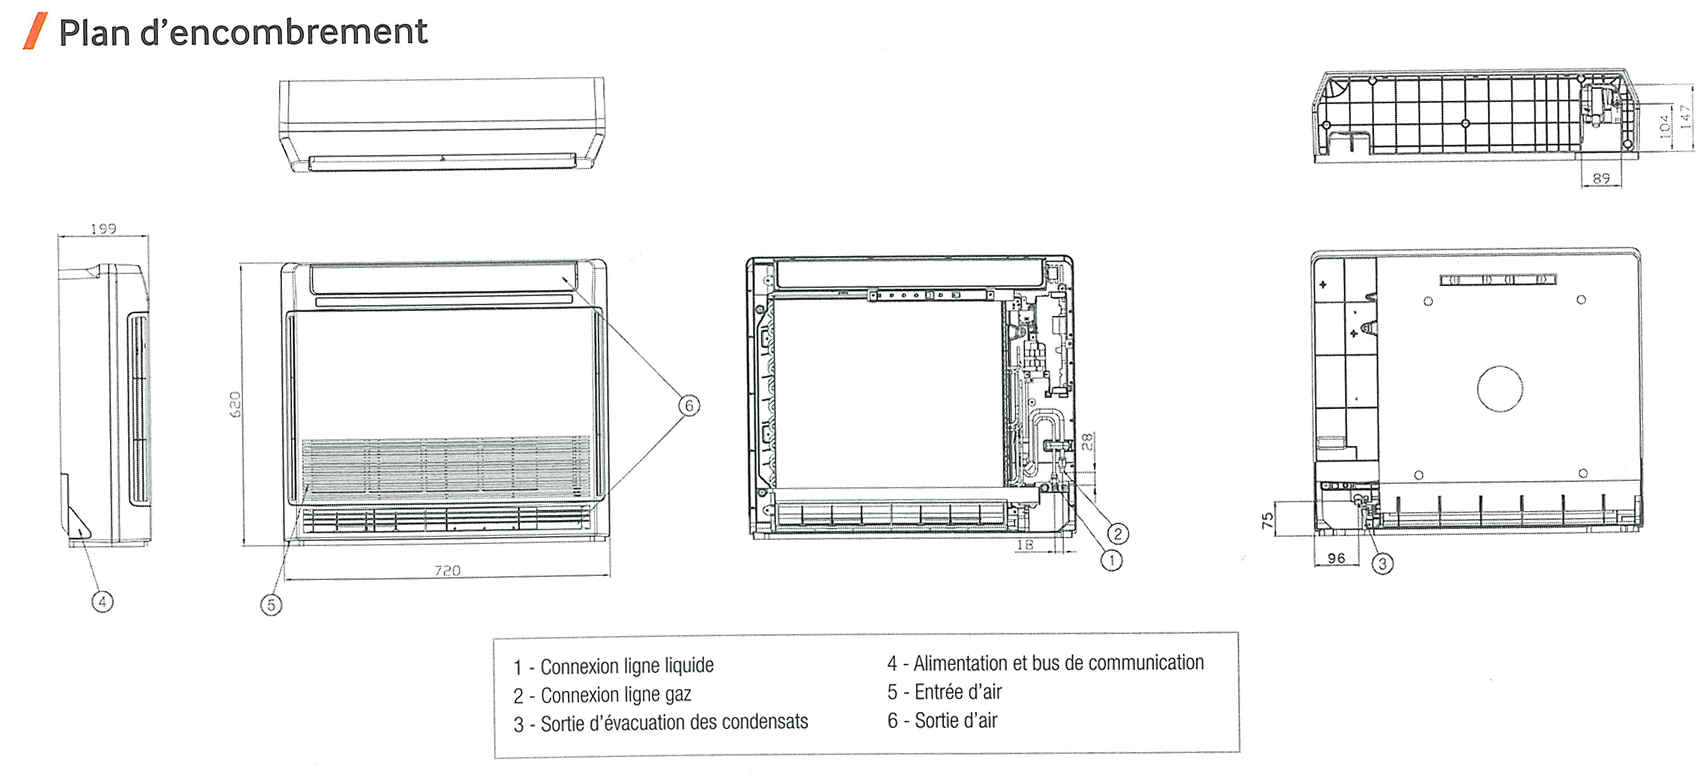 climatiseur console monosplit r versible samsung. Black Bedroom Furniture Sets. Home Design Ideas